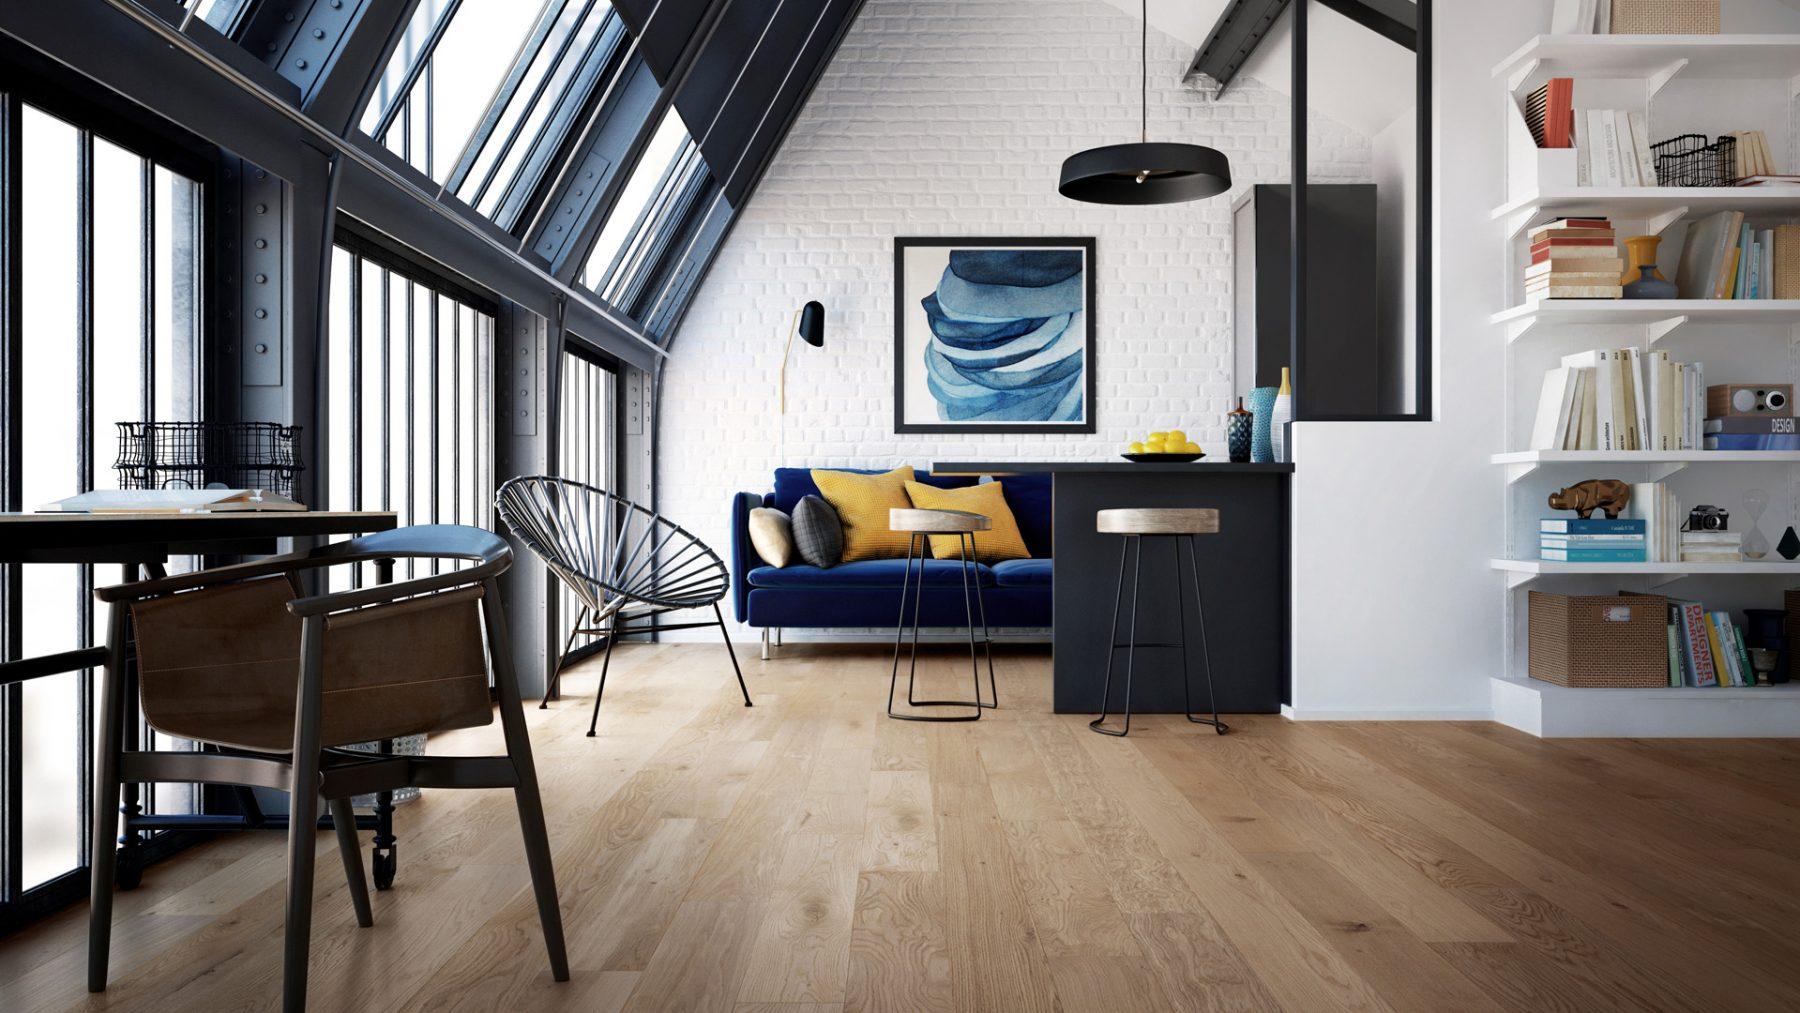 condo-photorealiste-3d-salon-blanc-plancher